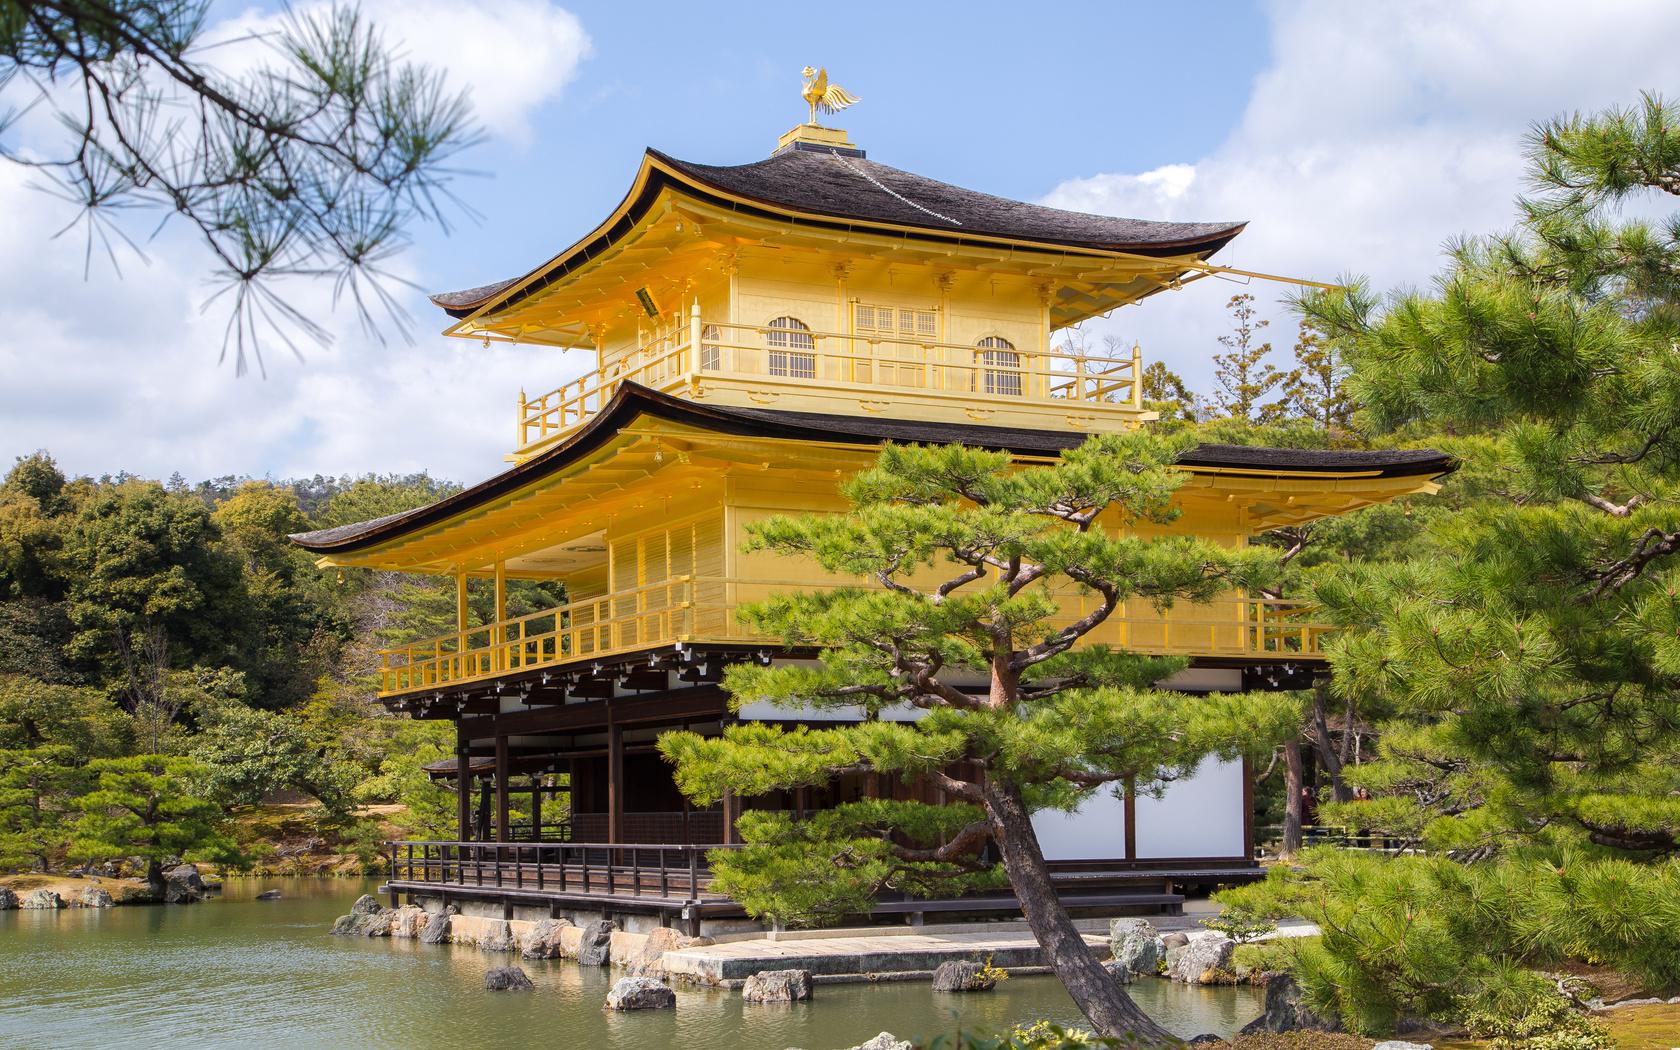 Япония, киото, храм kinkaku-ji temple, ель, город